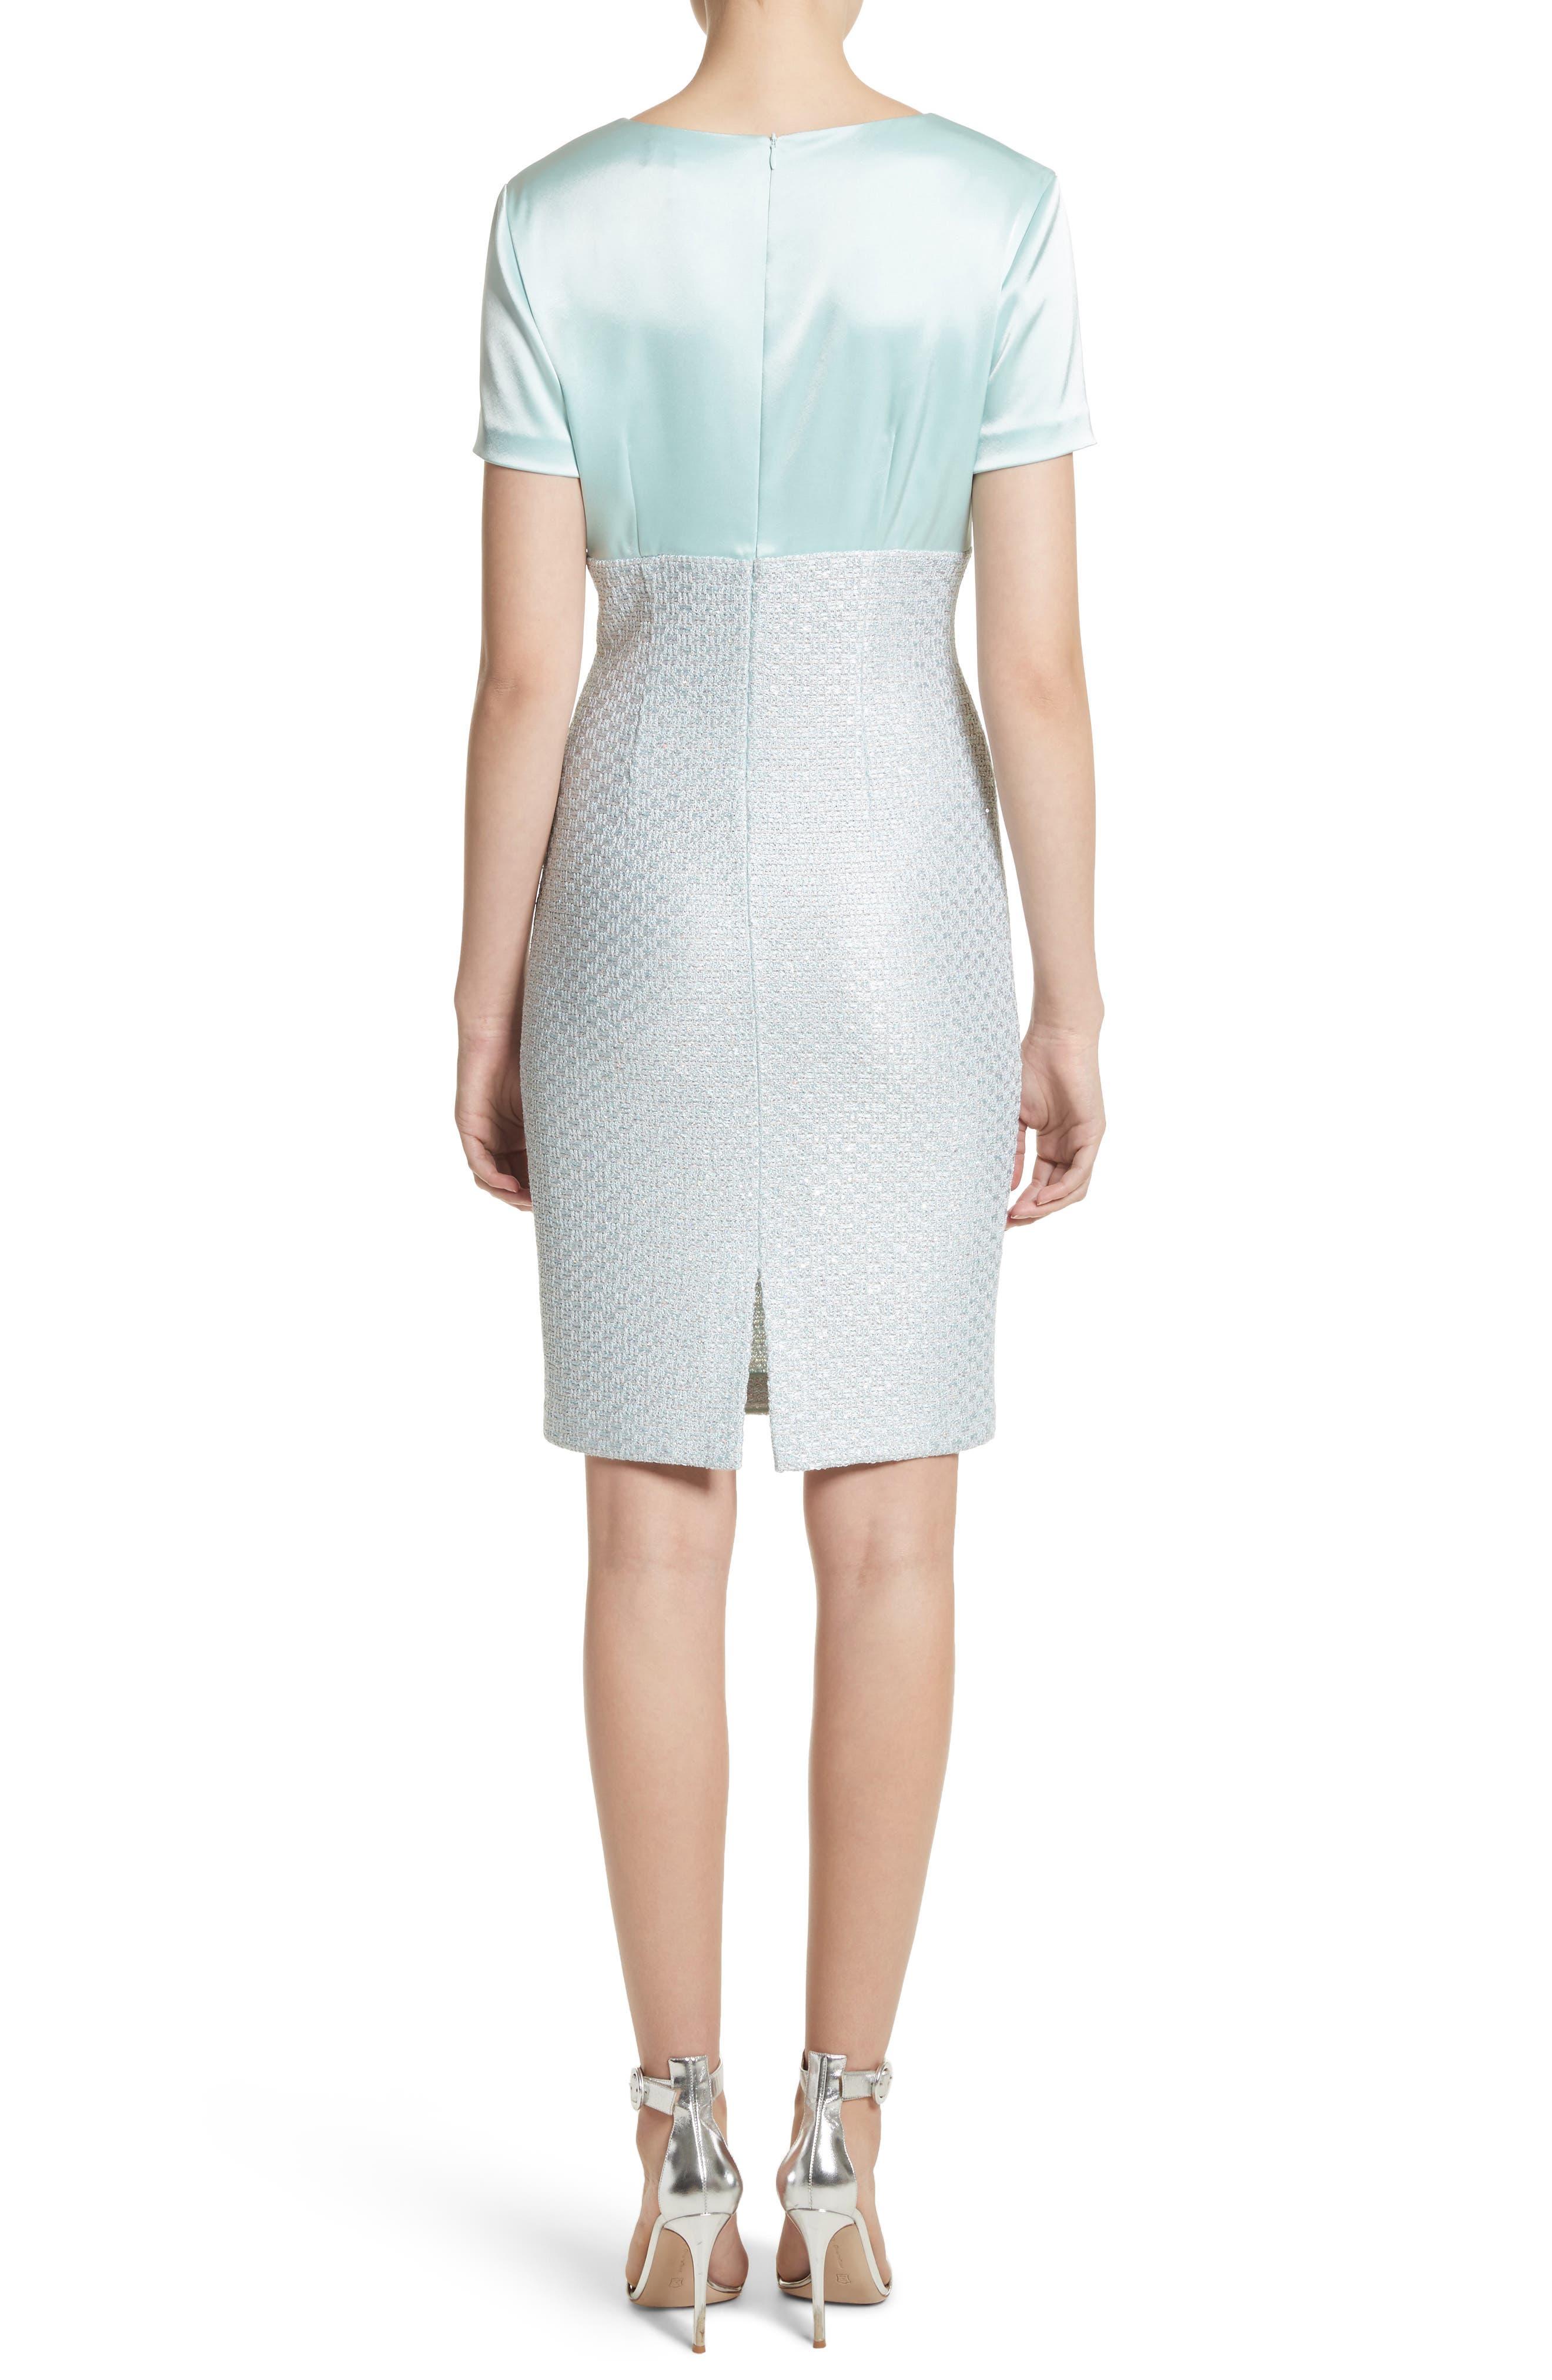 Hansh Satin & Knit Sheath Dress,                             Alternate thumbnail 2, color,                             440